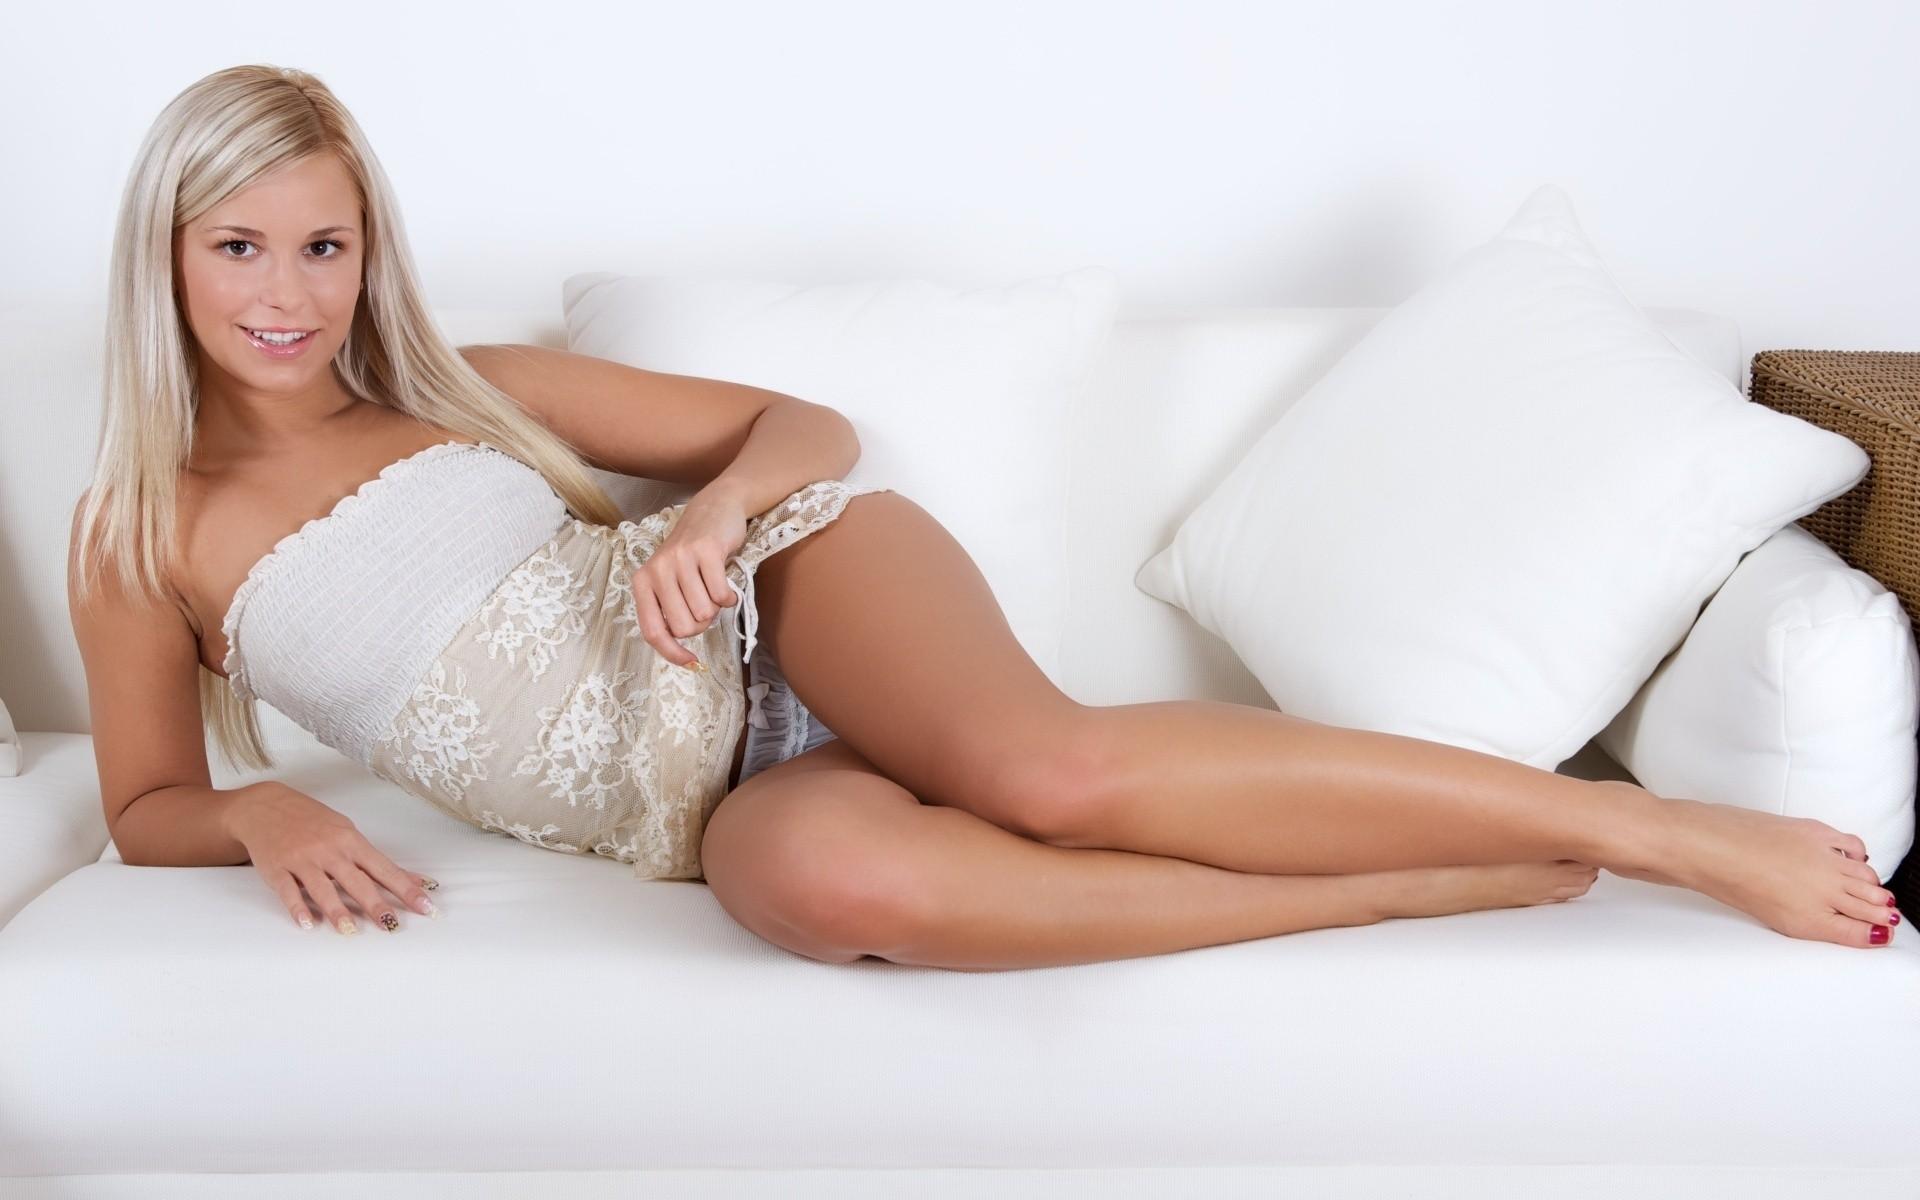 Lola Myluv - Model page